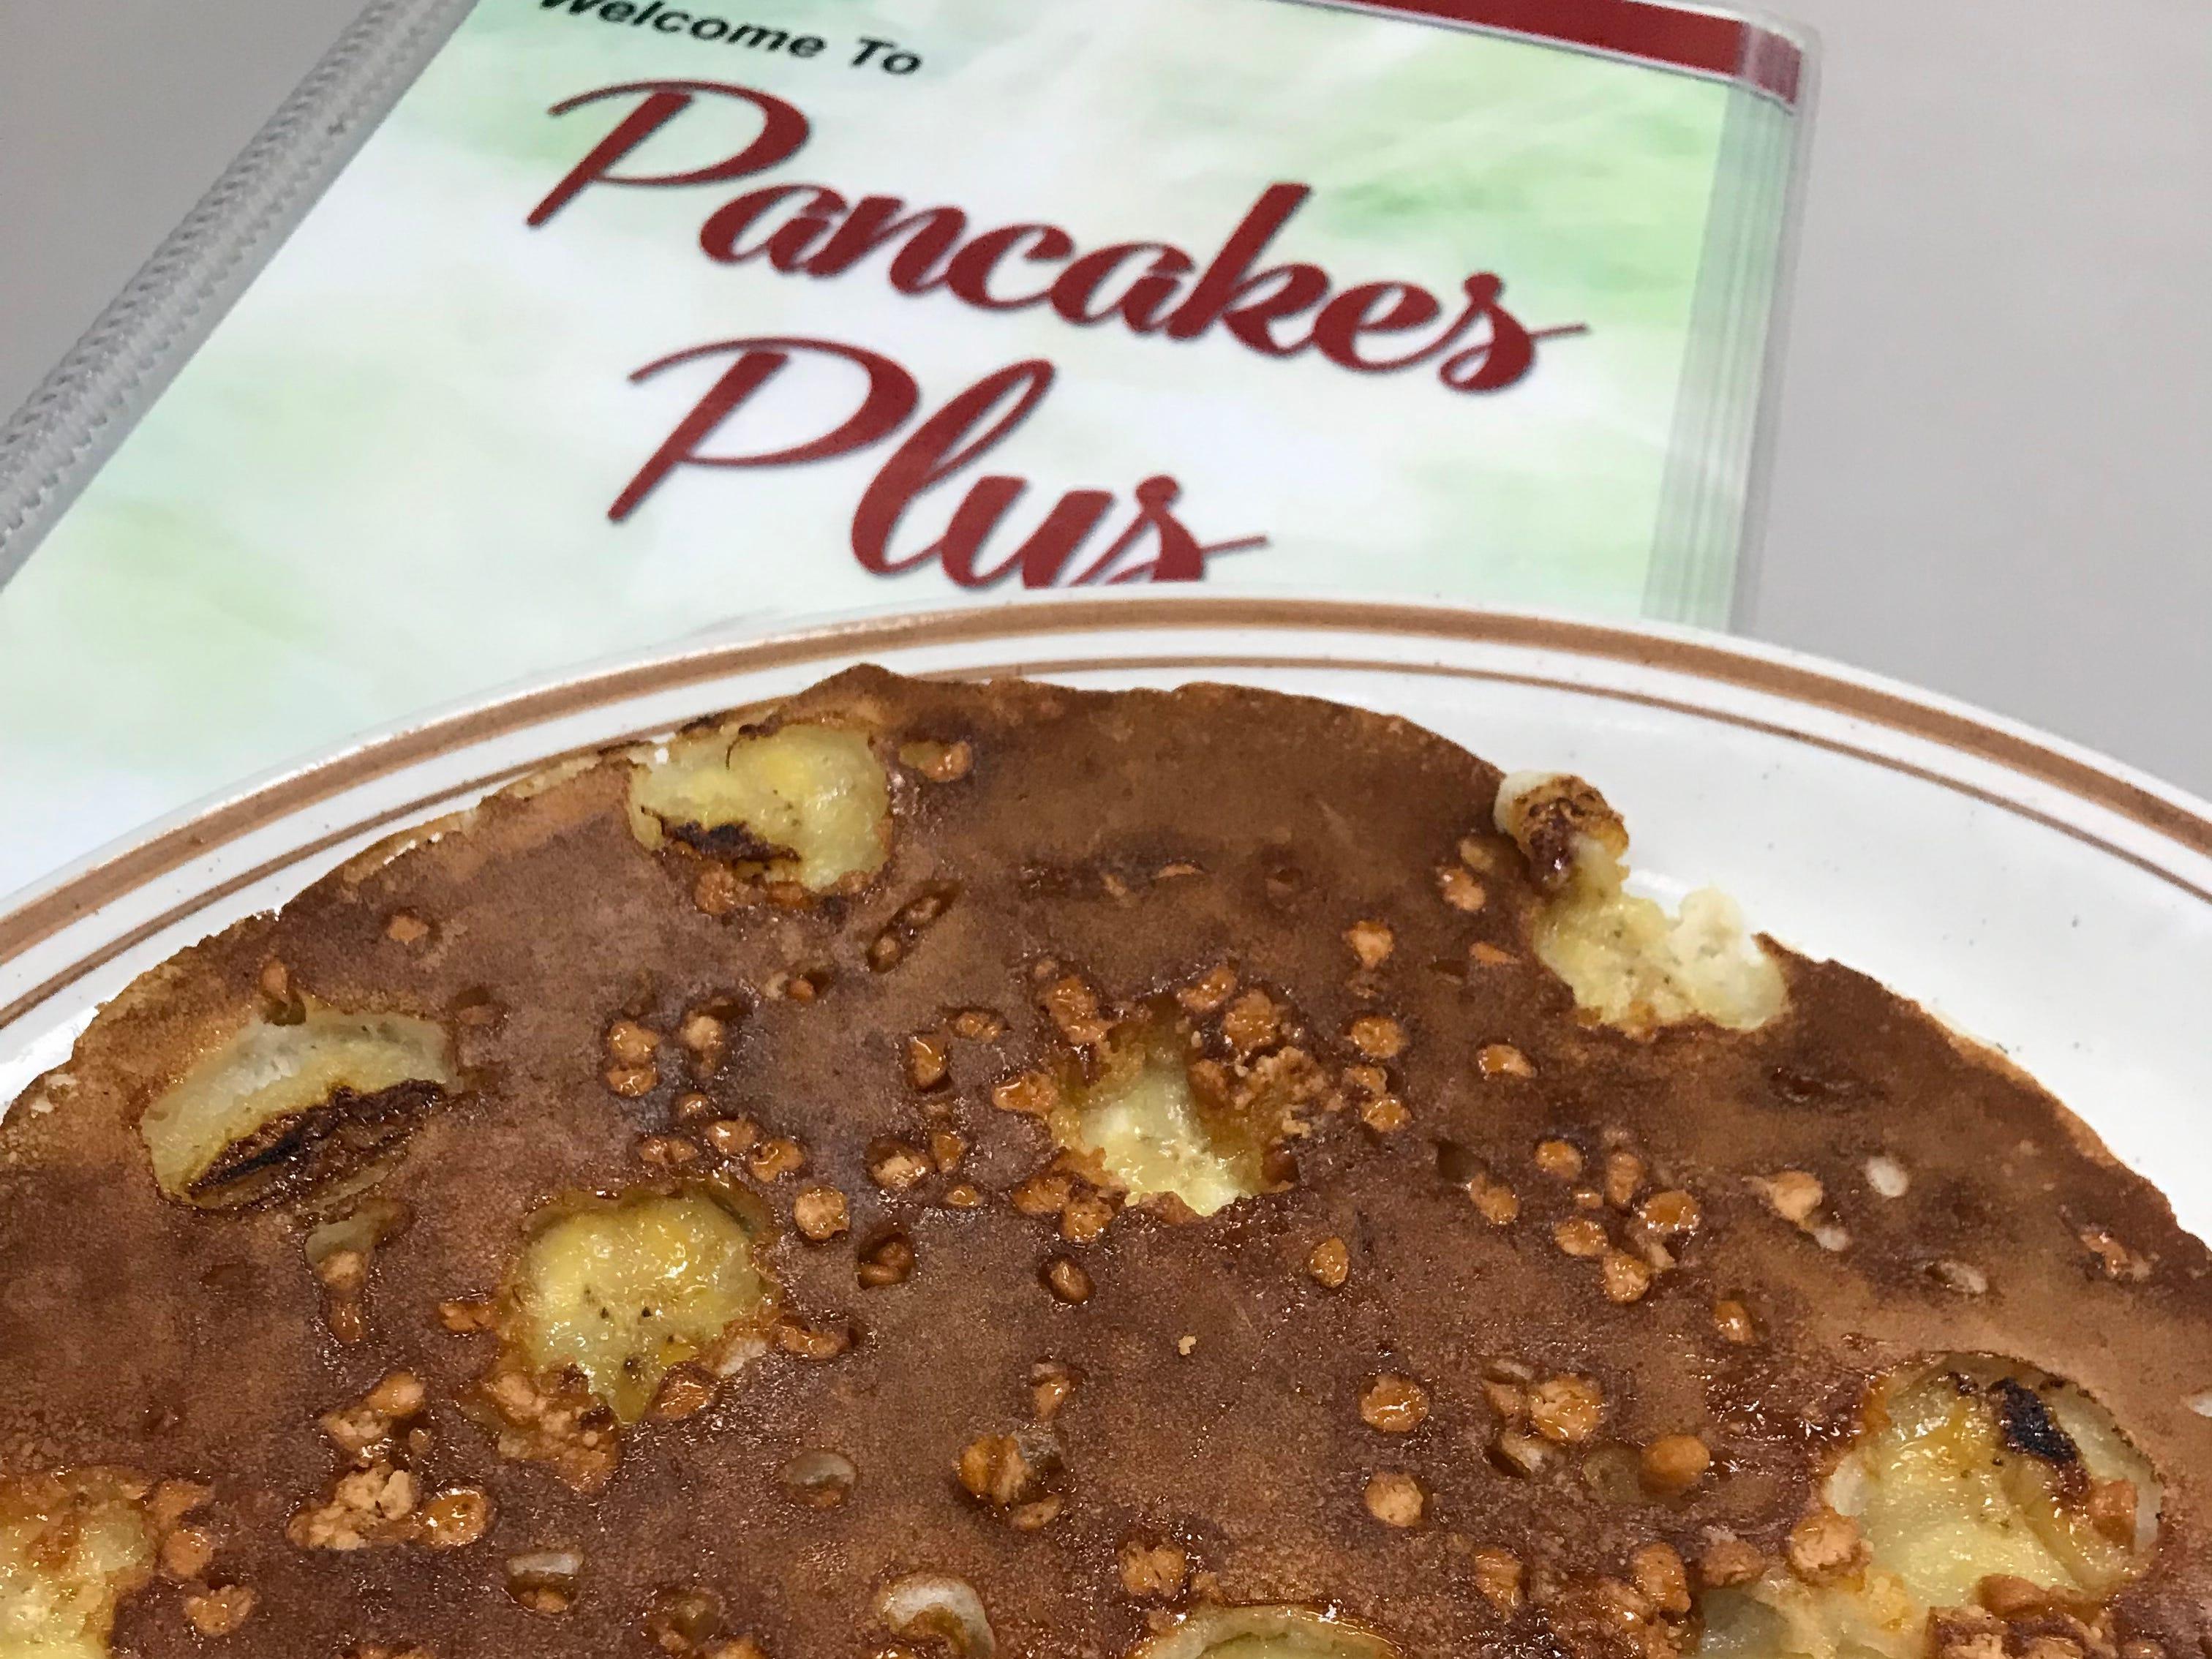 The banana butterscotch pancake at Pancakes Plus in Nanuet. Photographed Nov. 30, 2018.